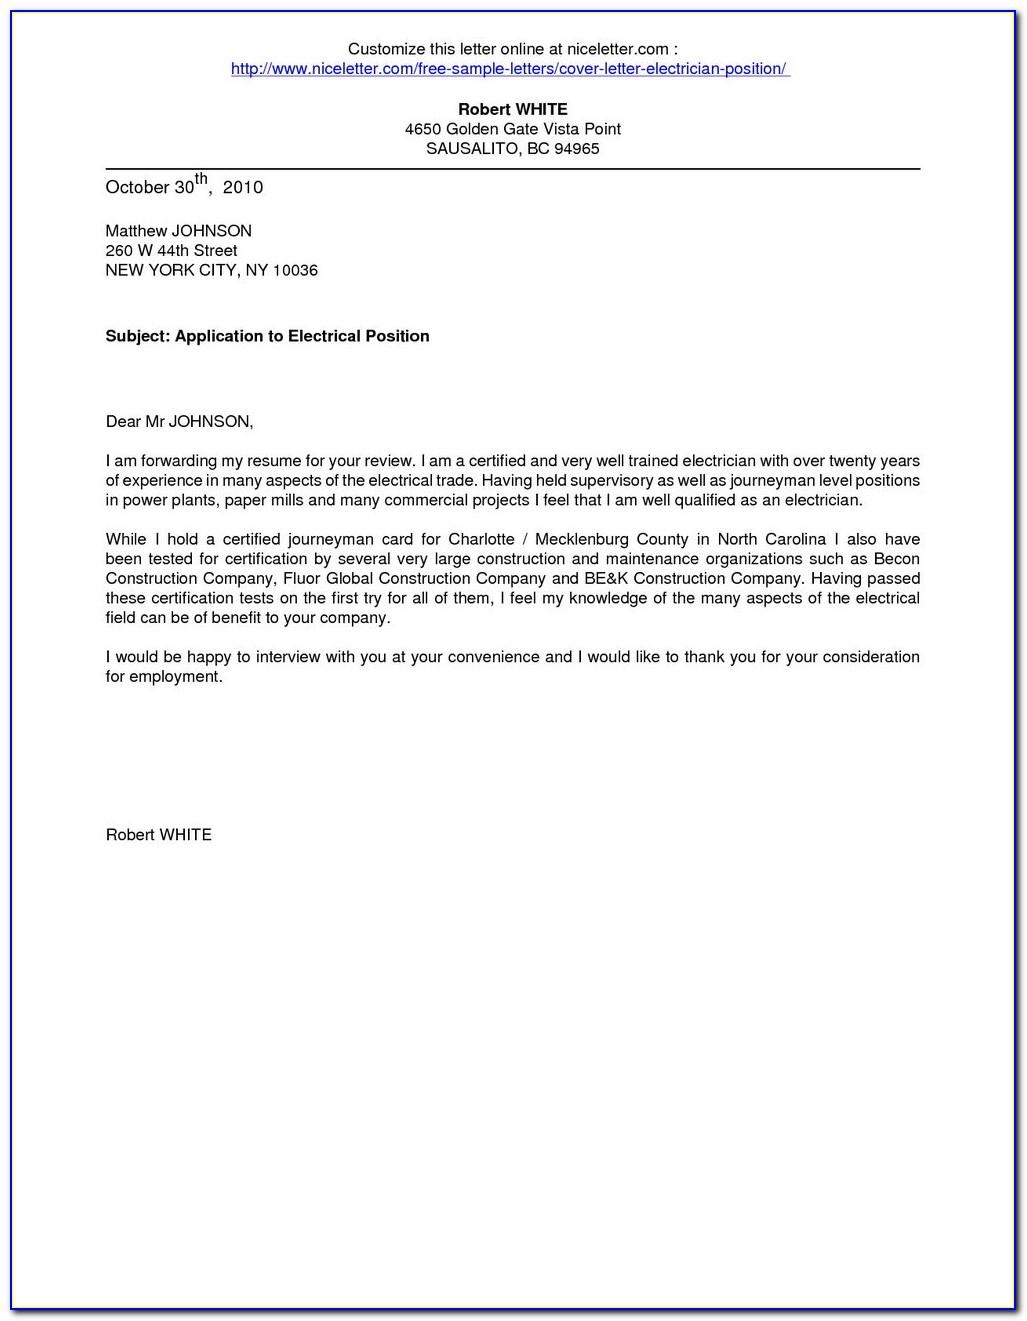 Electrician Job Application Letter Sample - Job Applications ...